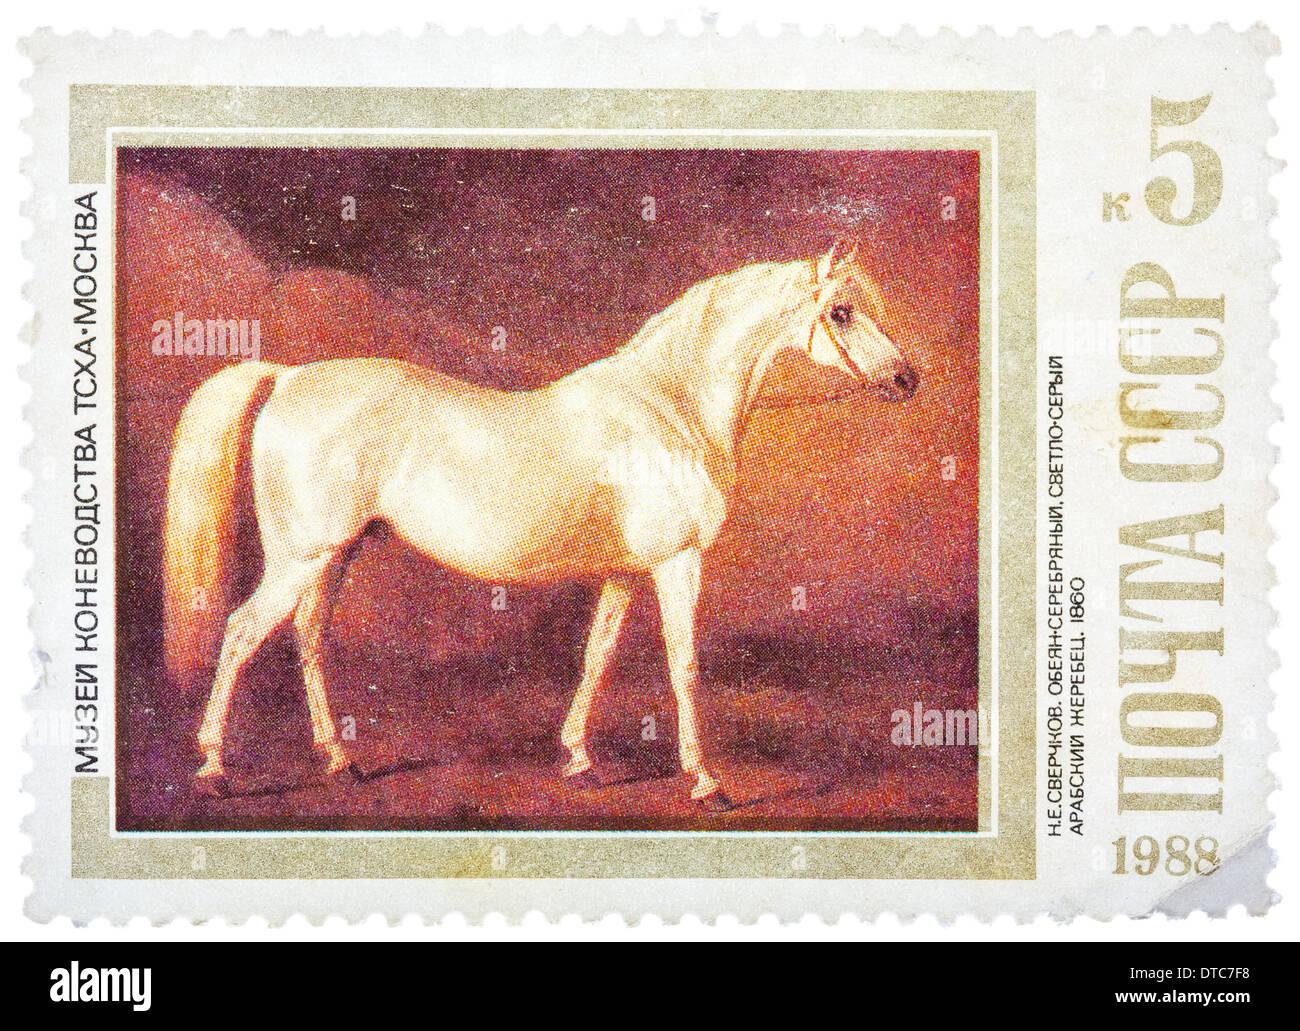 USSR - CIRCA 1988: A stamp printed in USSR shows painting 'Light Gray Arabian Stallion' by Nikolai Sverchkov, series, circa 1988 - Stock Image